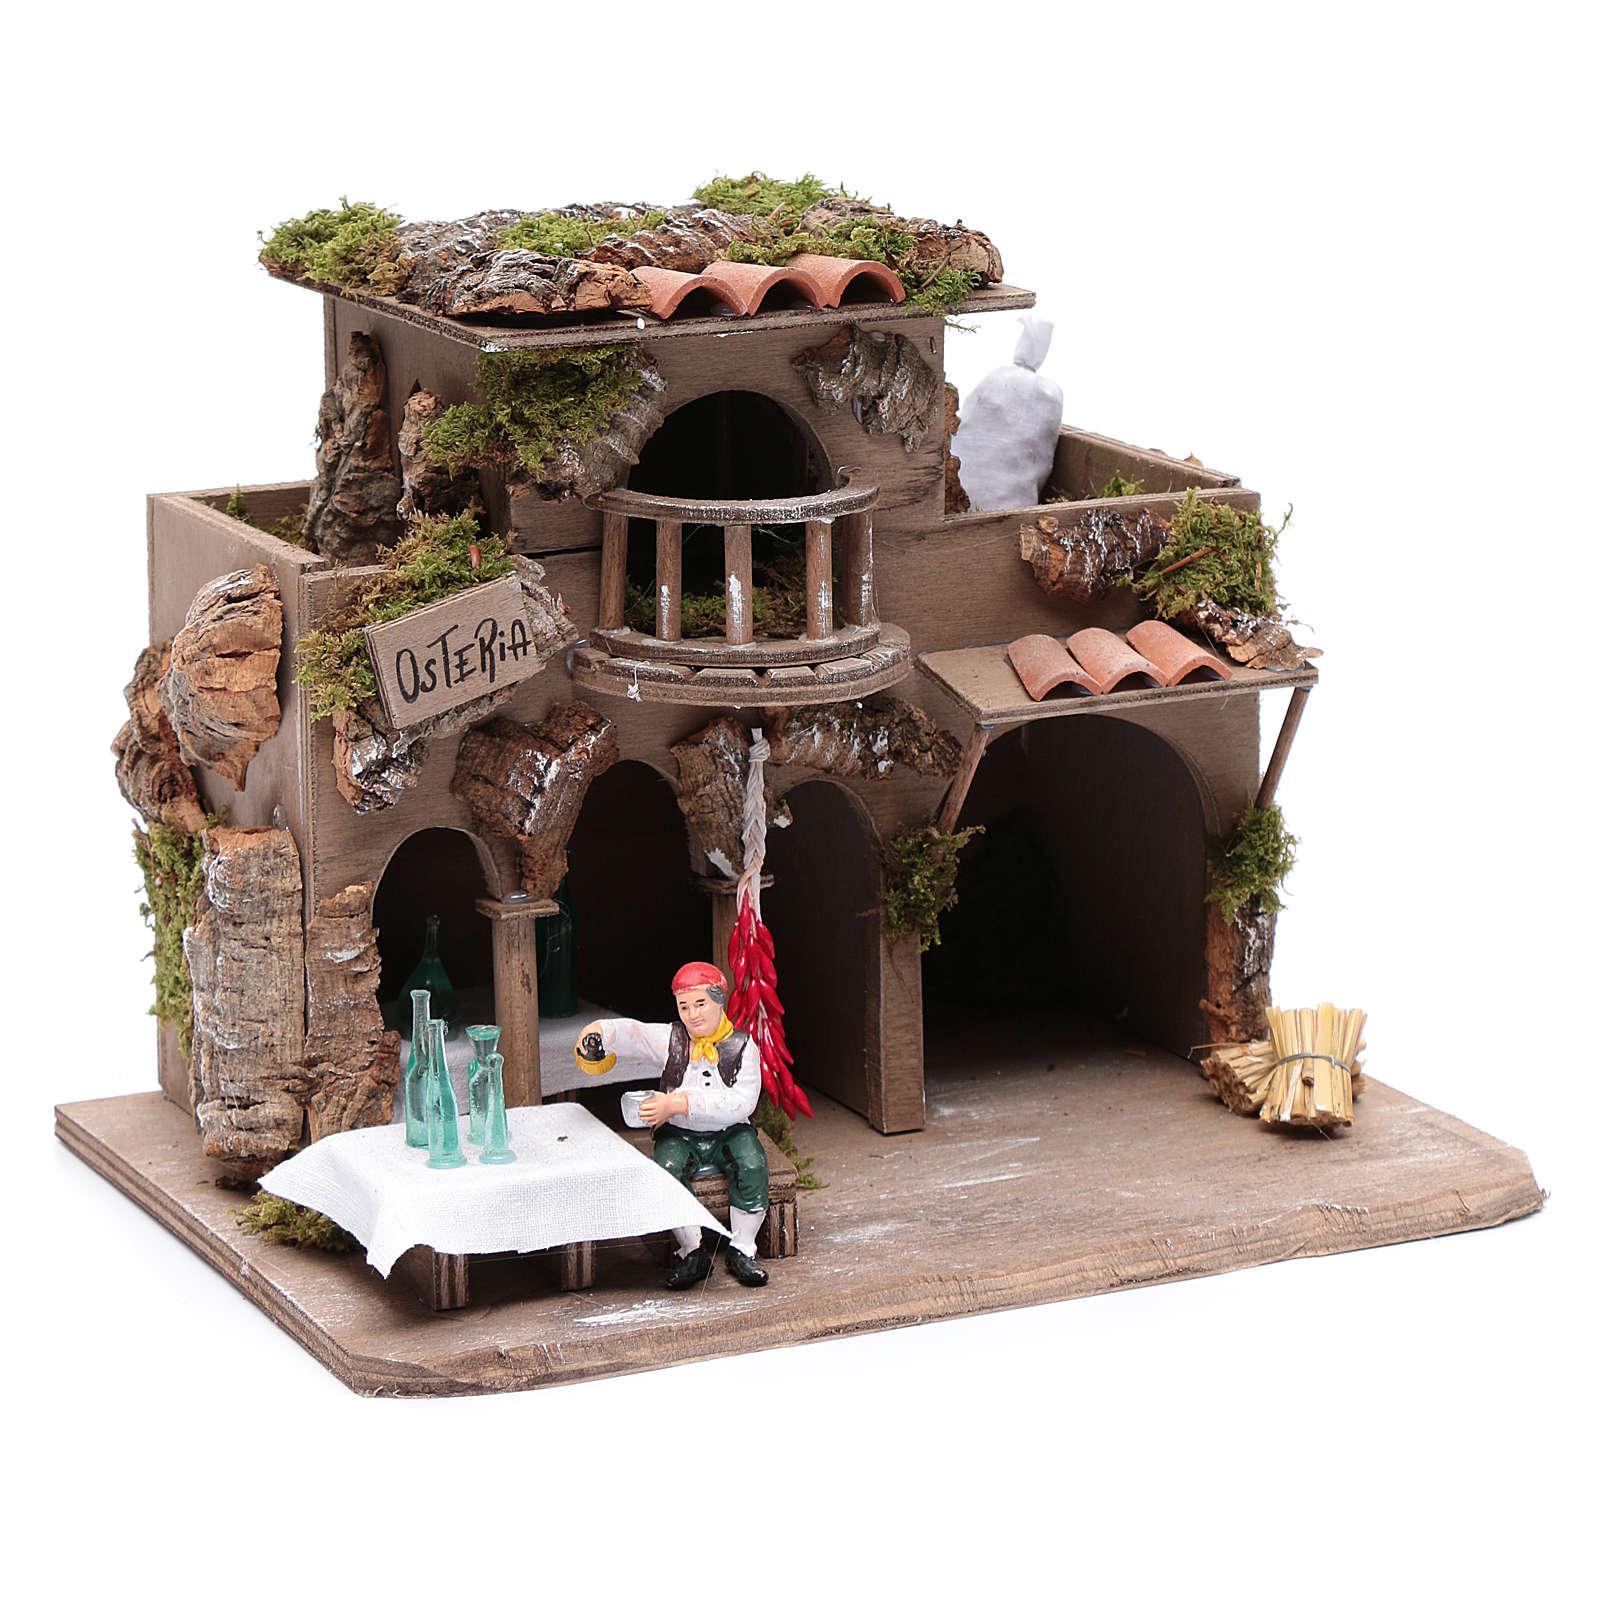 Inn with drinker for nativity scene 20x30x20 cm 4